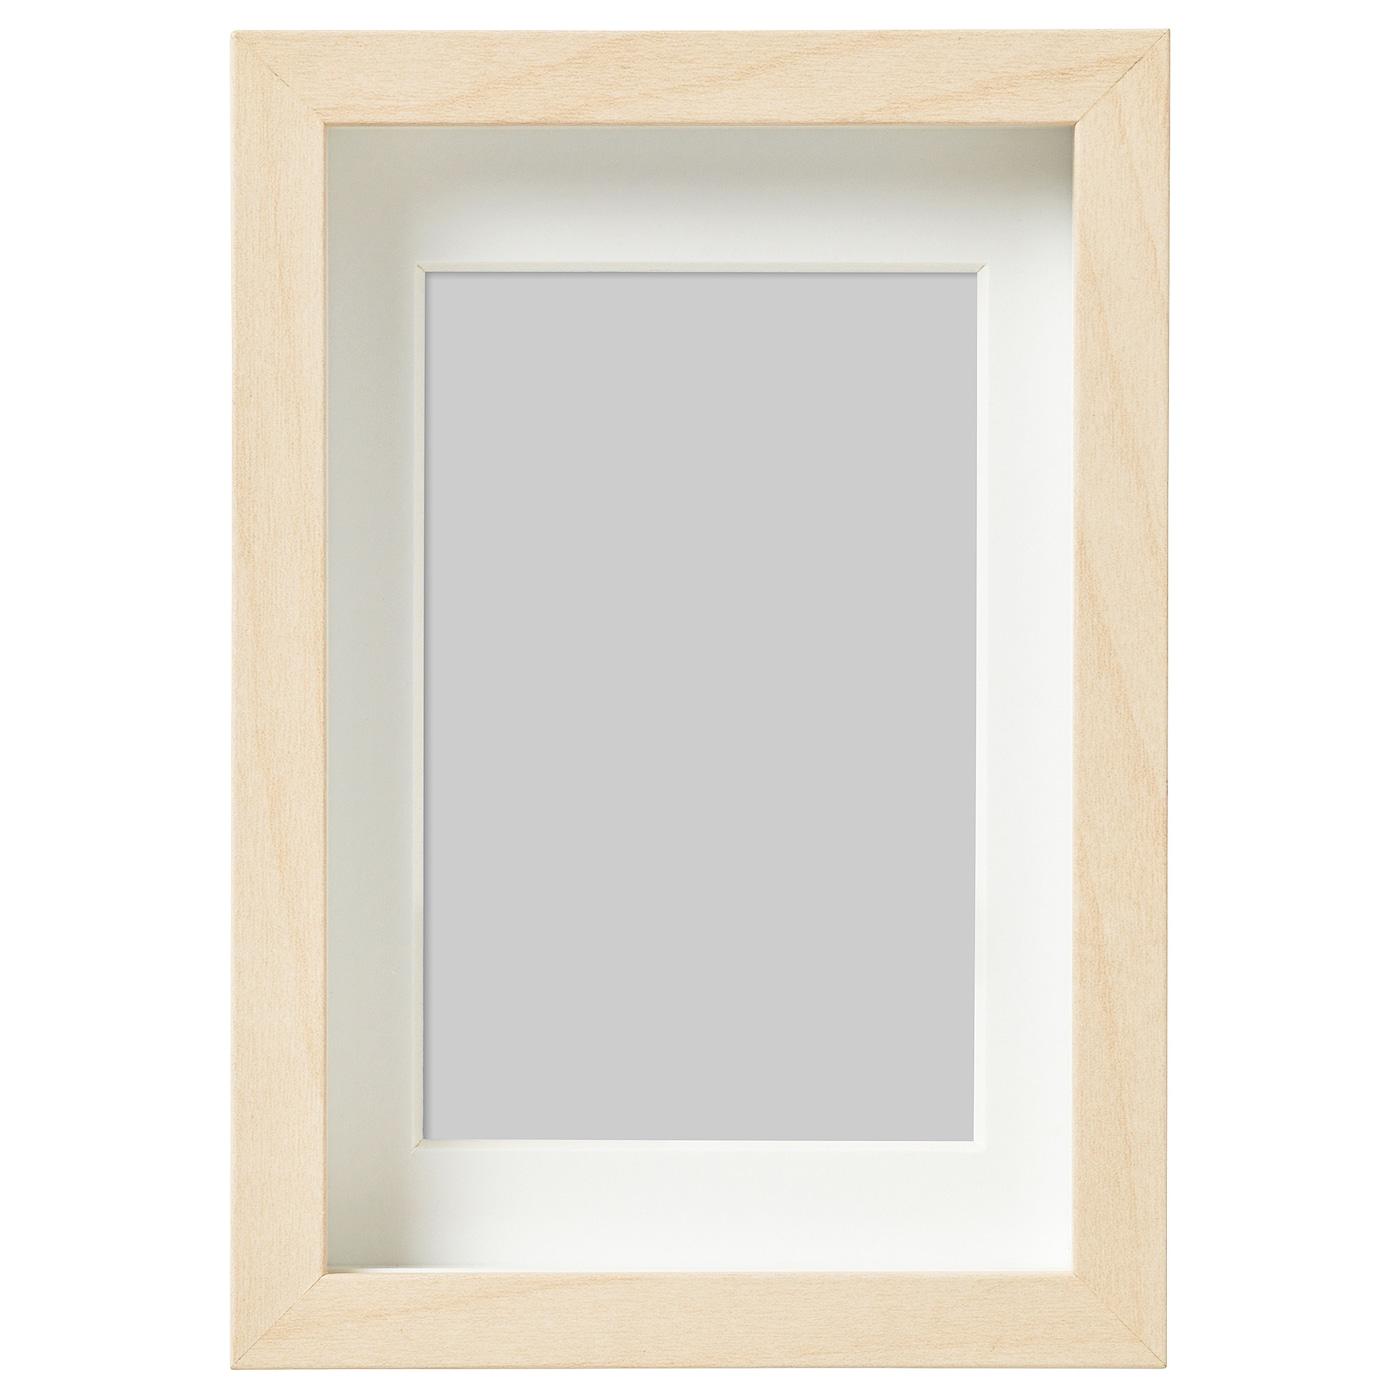 HOVSTA Marco Efecto abedul 10 x 15 cm - IKEA